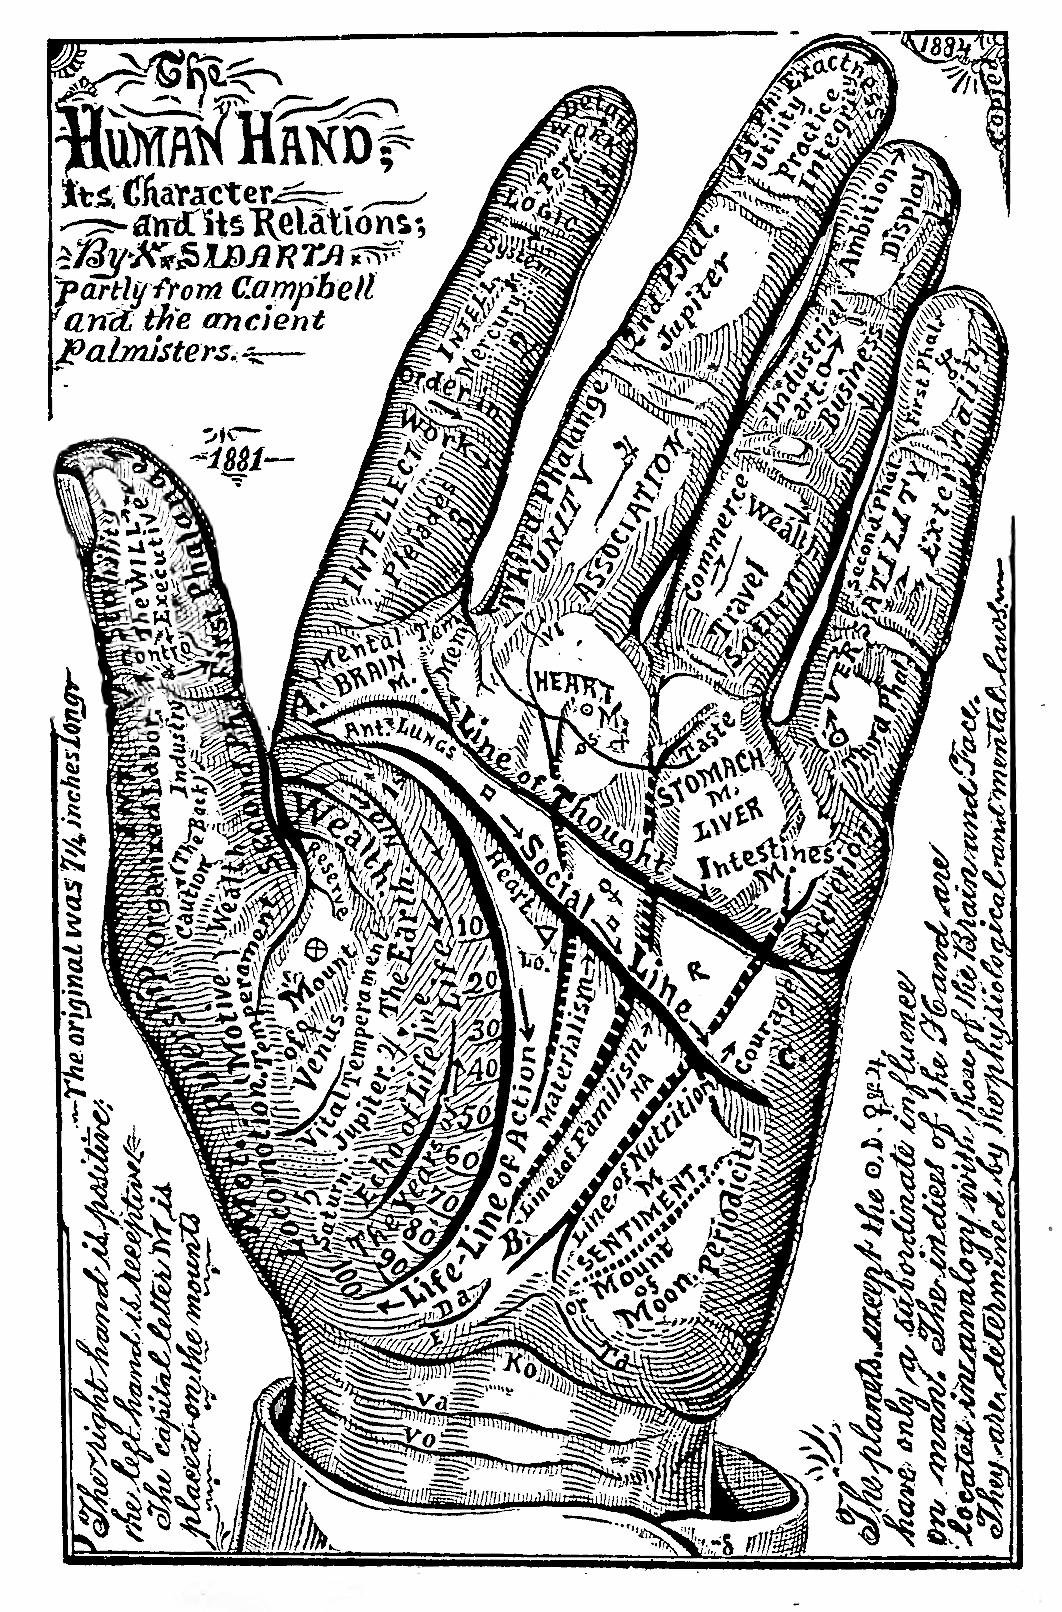 53_human_hand_1884.jpg